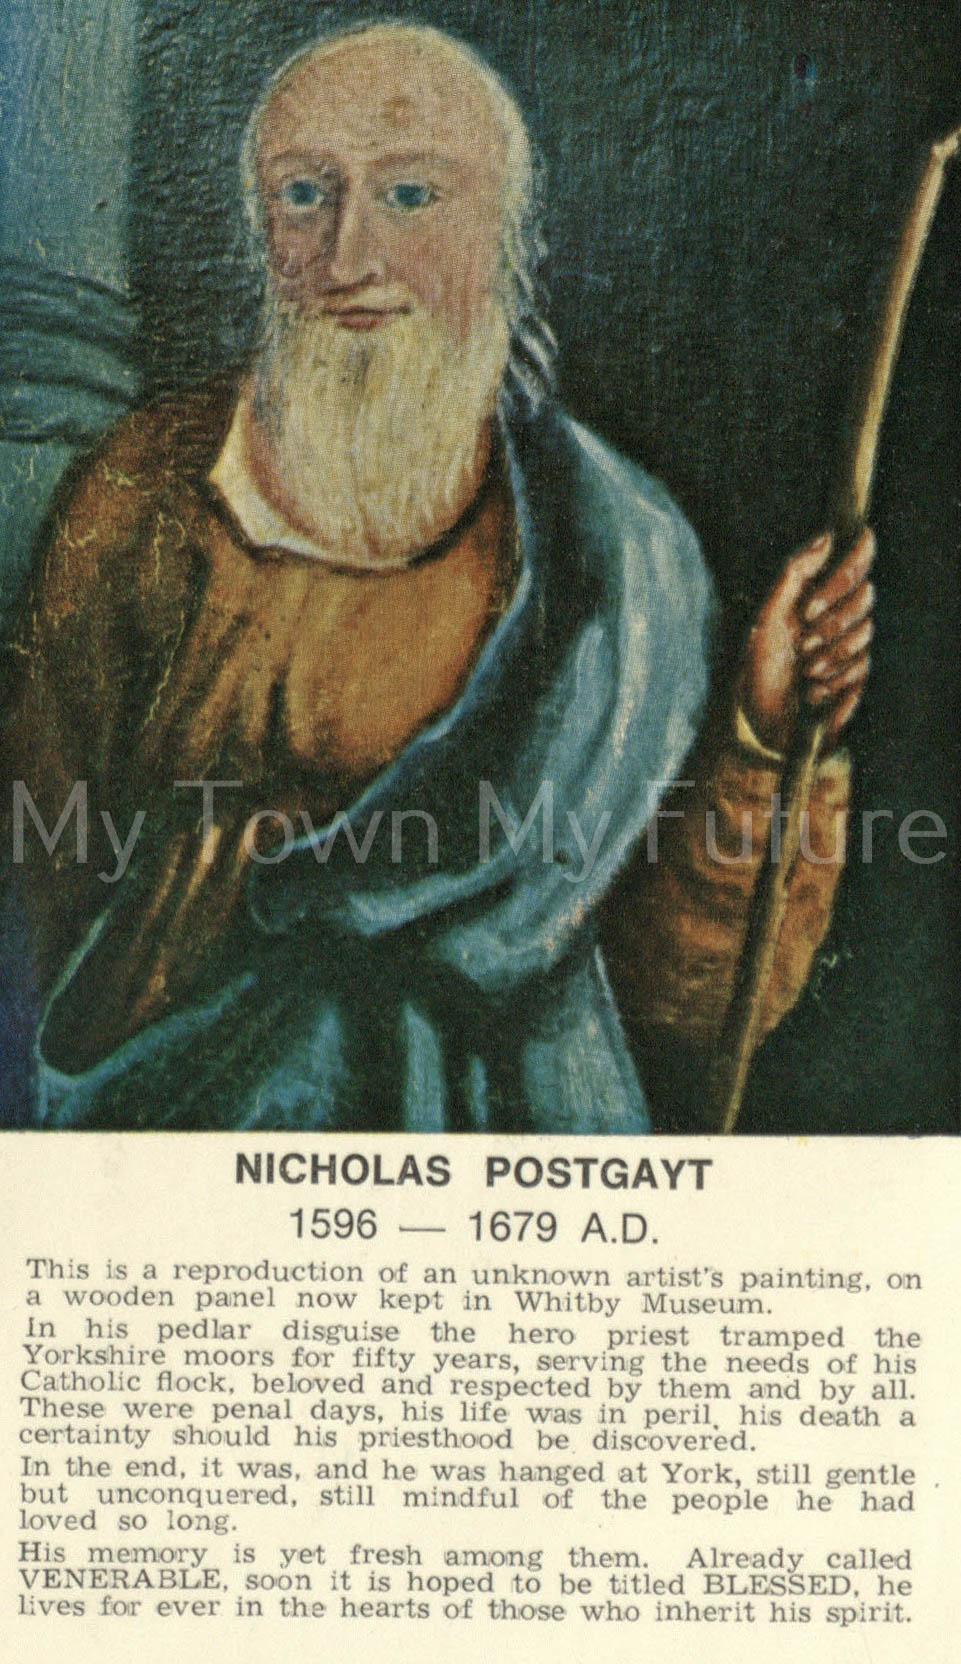 Nicholas Postgayt